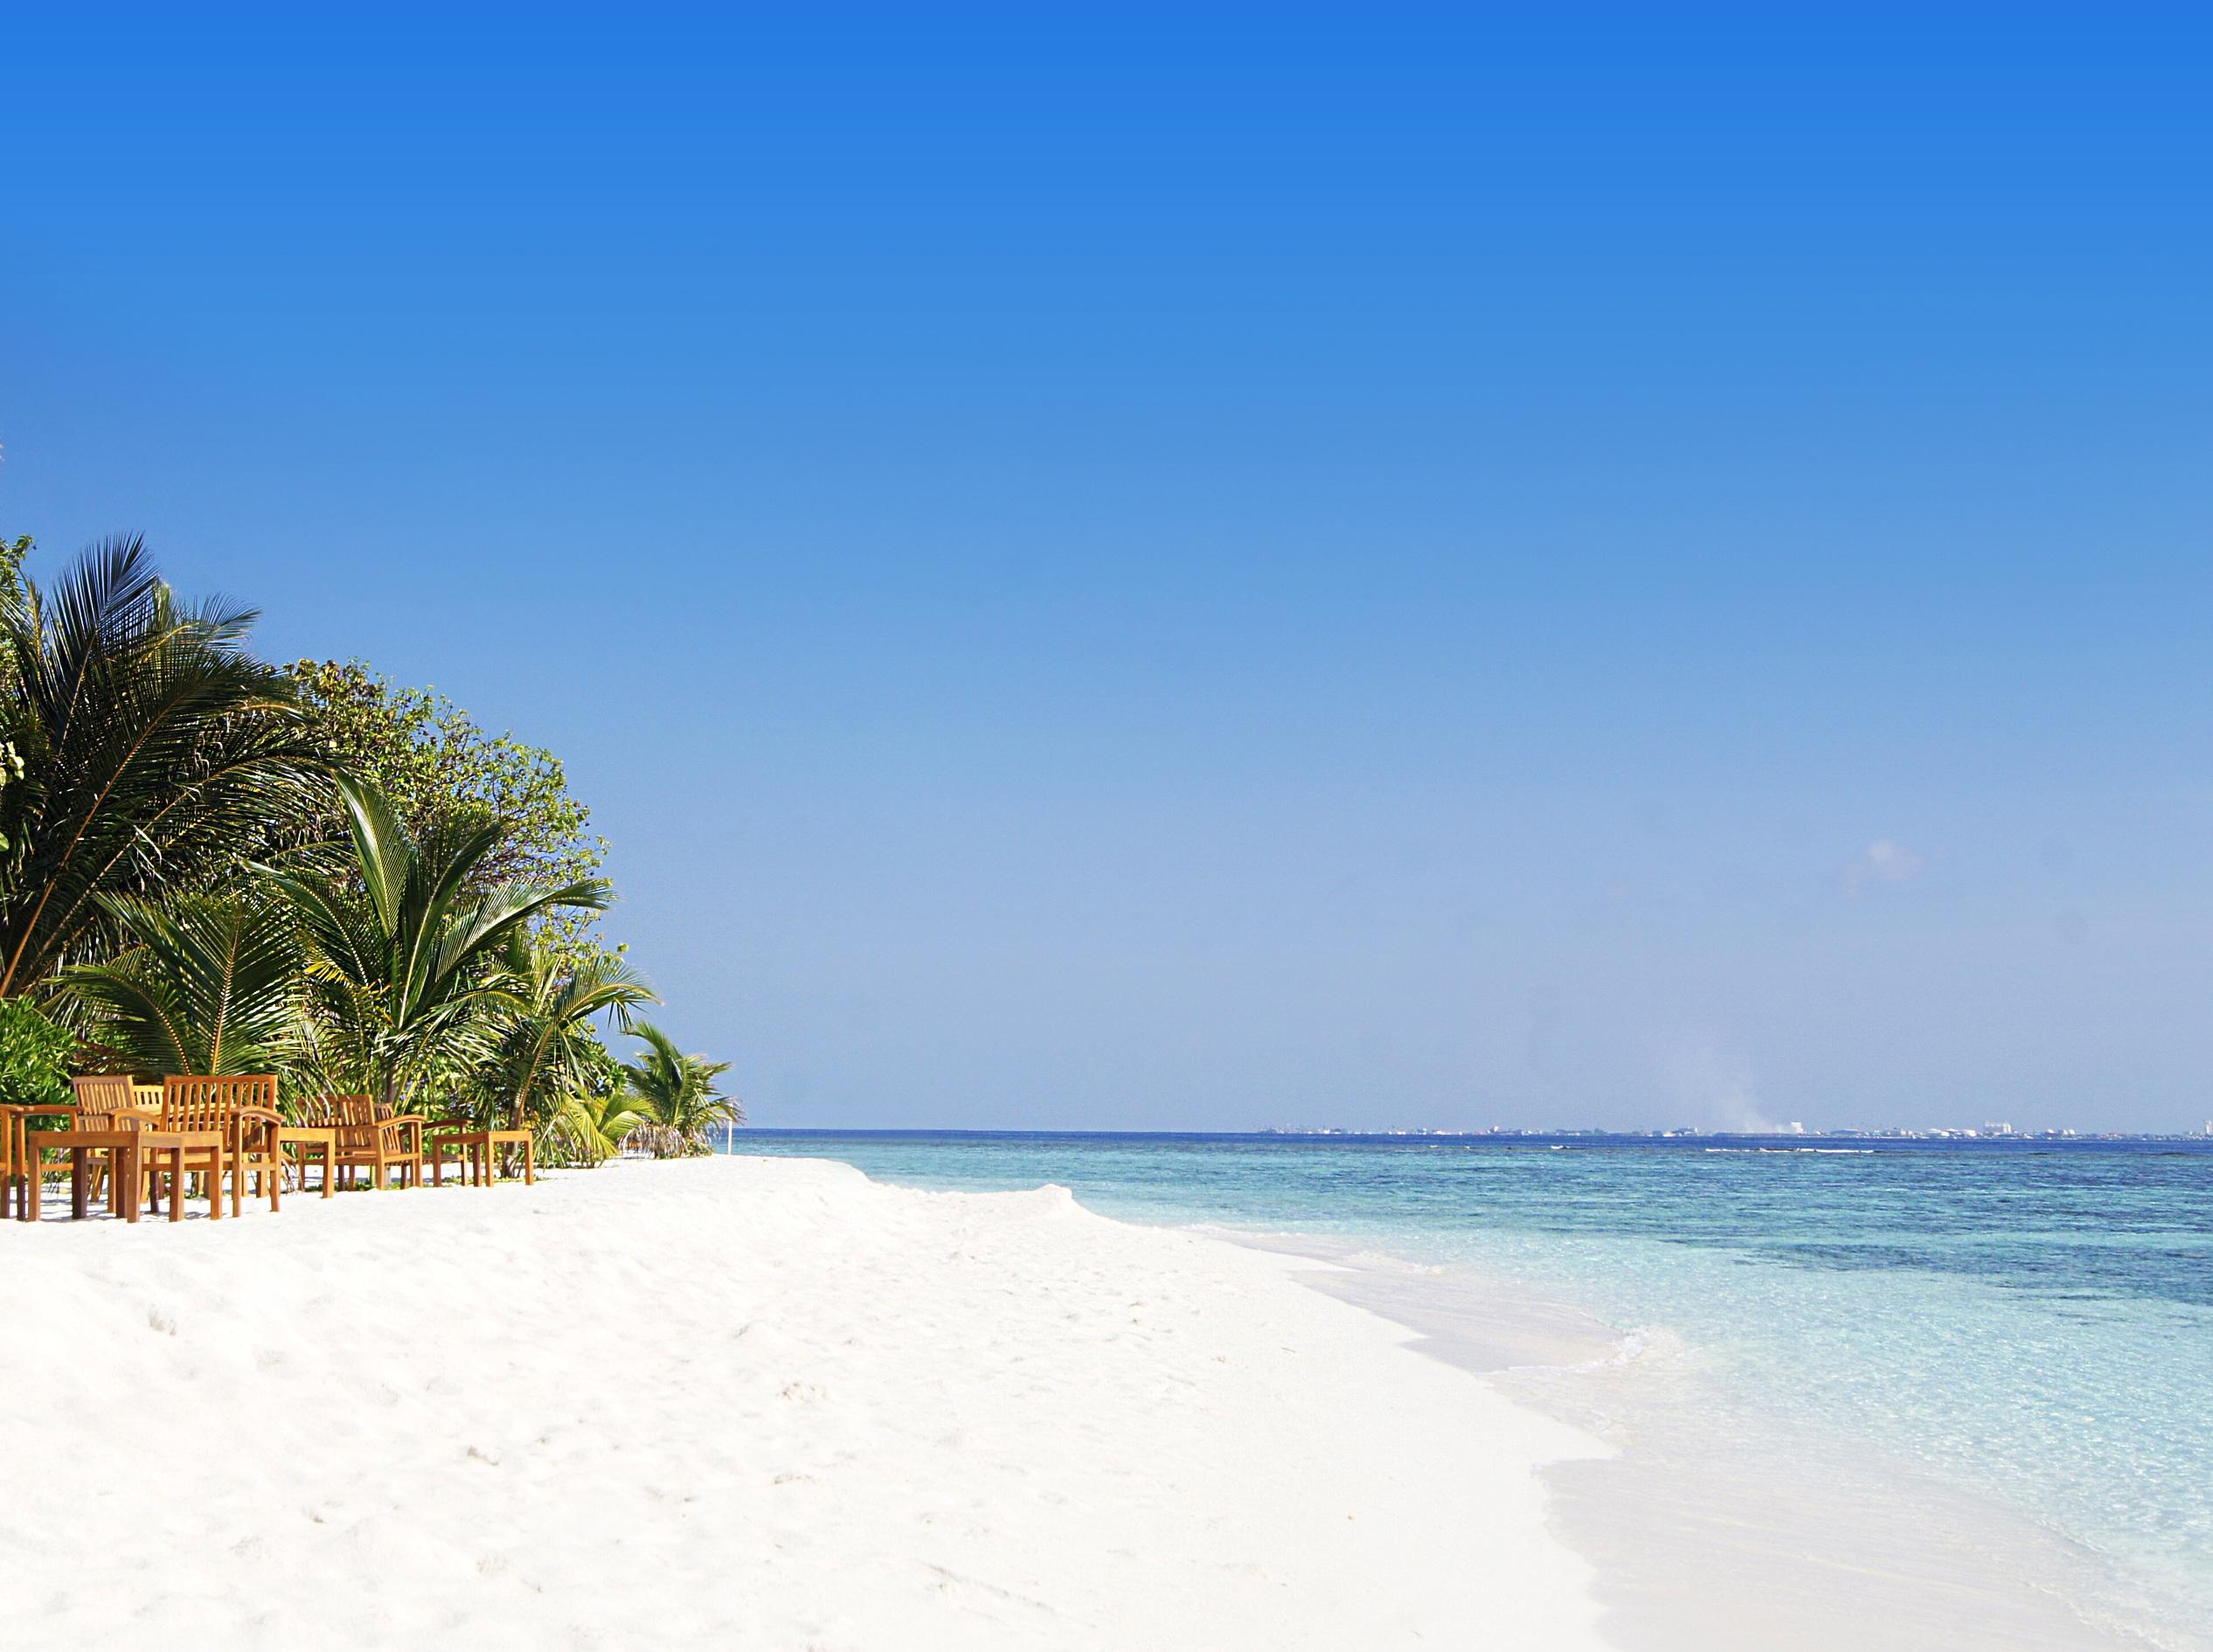 Beach Sand Clouds Sea Caribbean Water Peaceful: Free Images : Beach, Sea, Coast, Sand, Ocean, Horizon